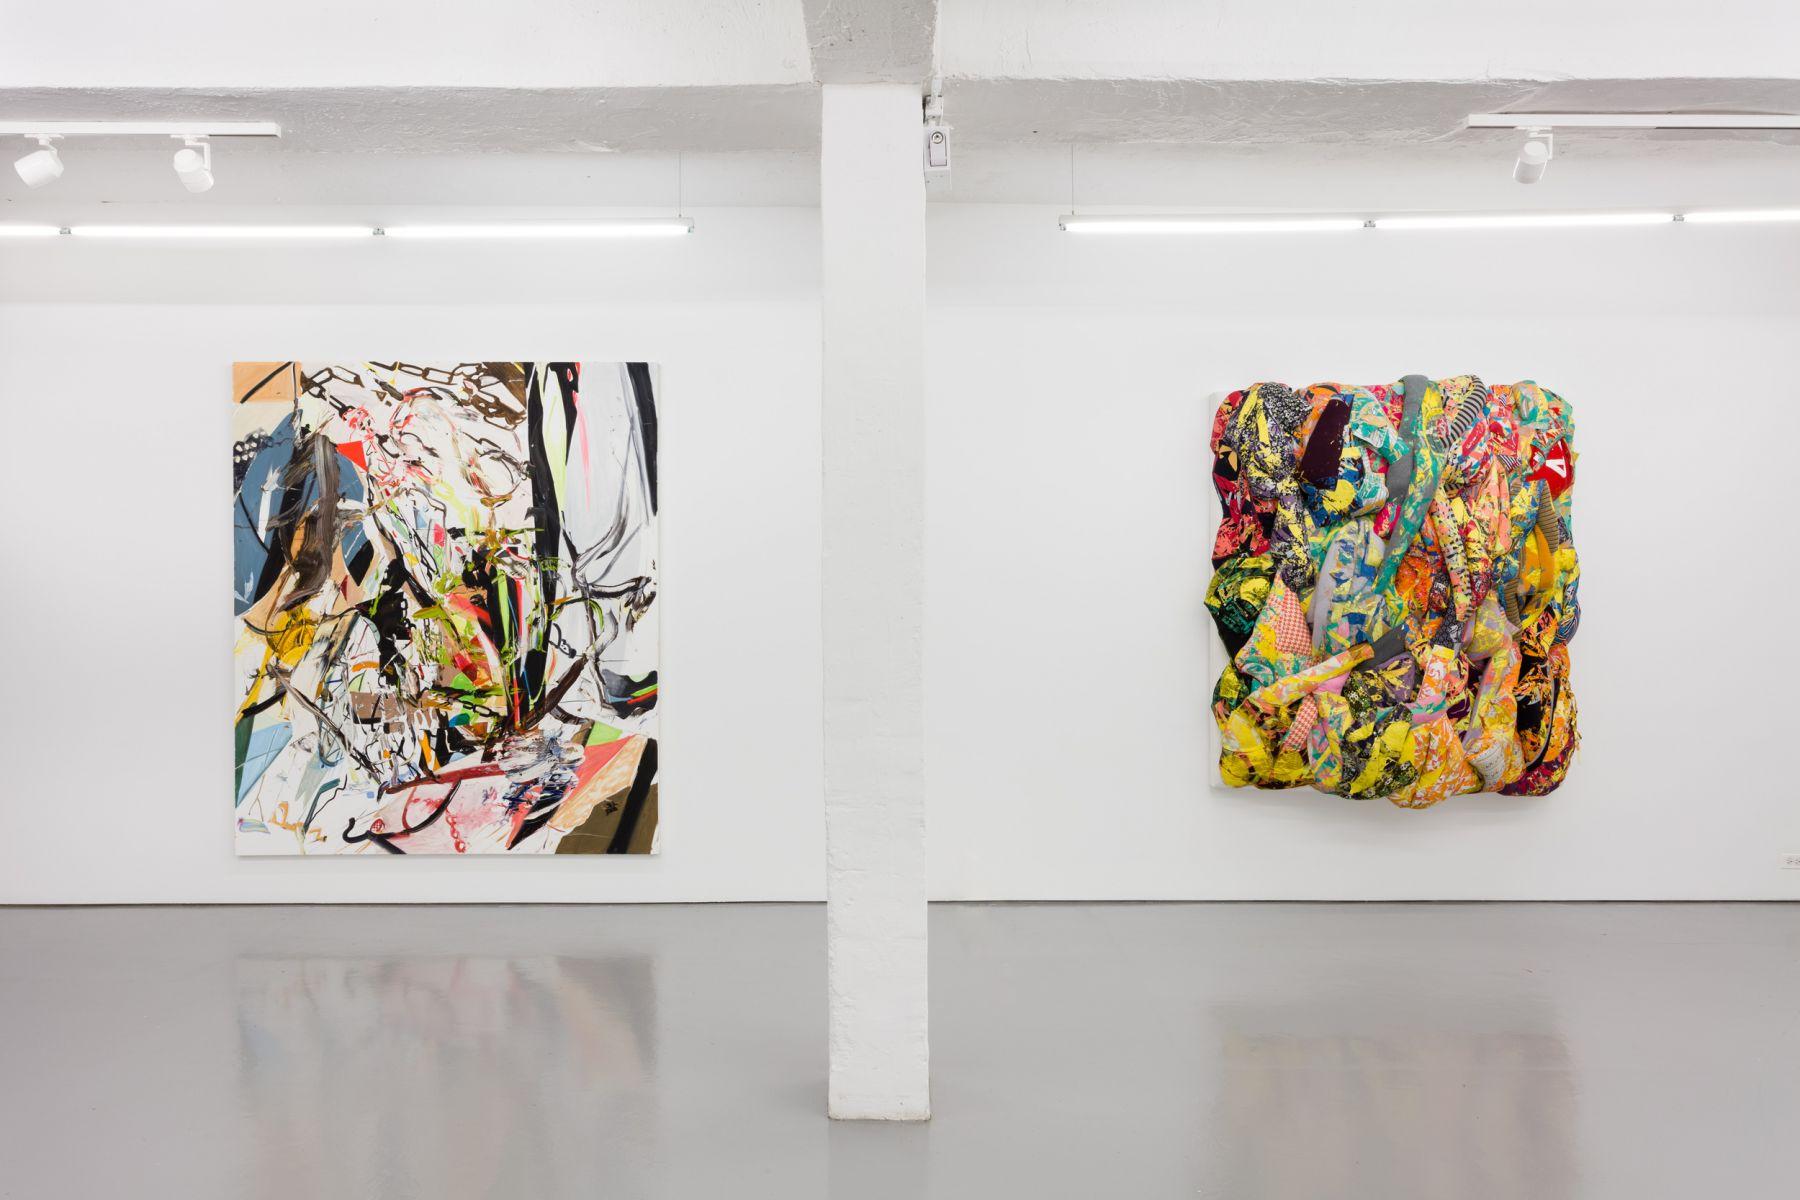 Gallery installation view, 2018, left: John Williams;right: Aiko Hachisuka